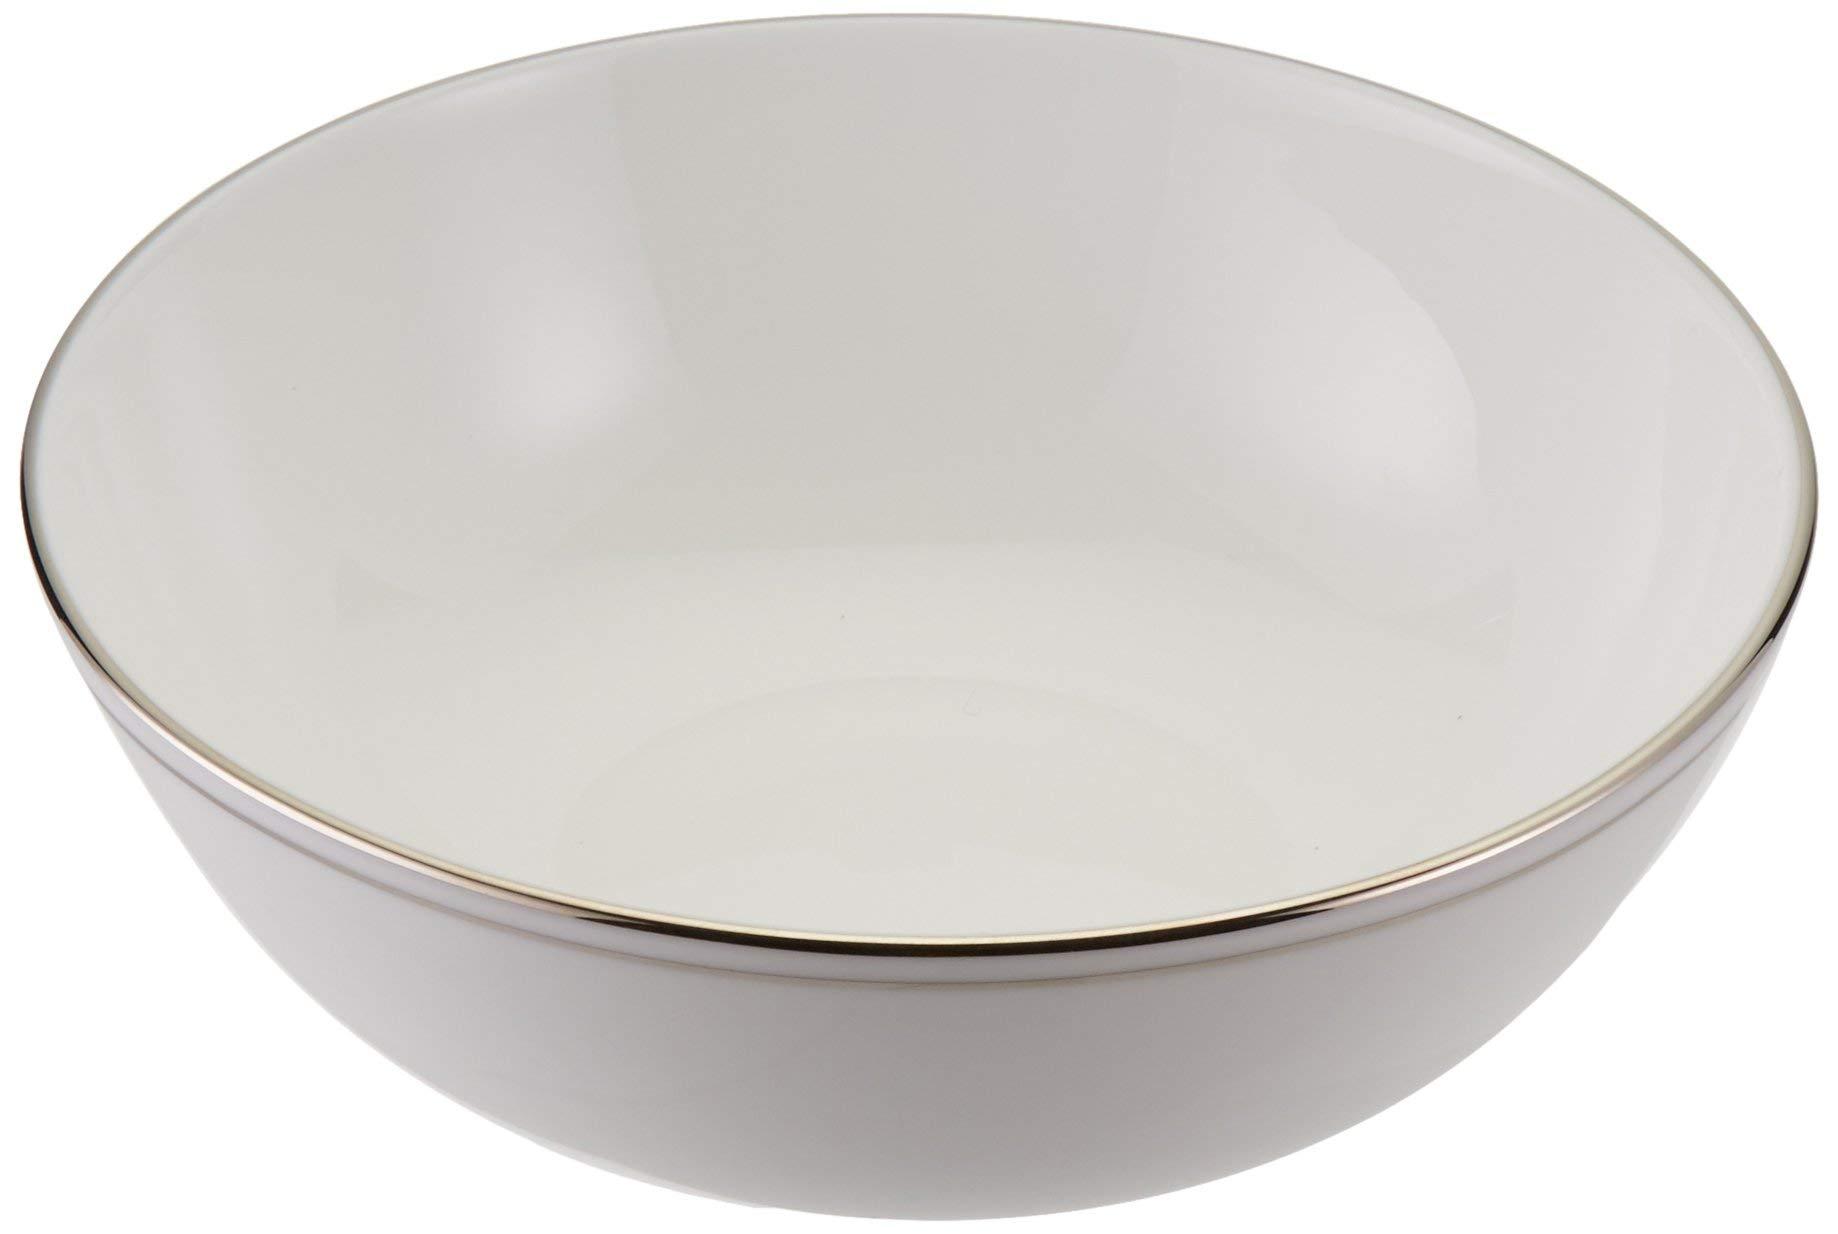 Lenox Federal Platinum Place Setting Bowl, White